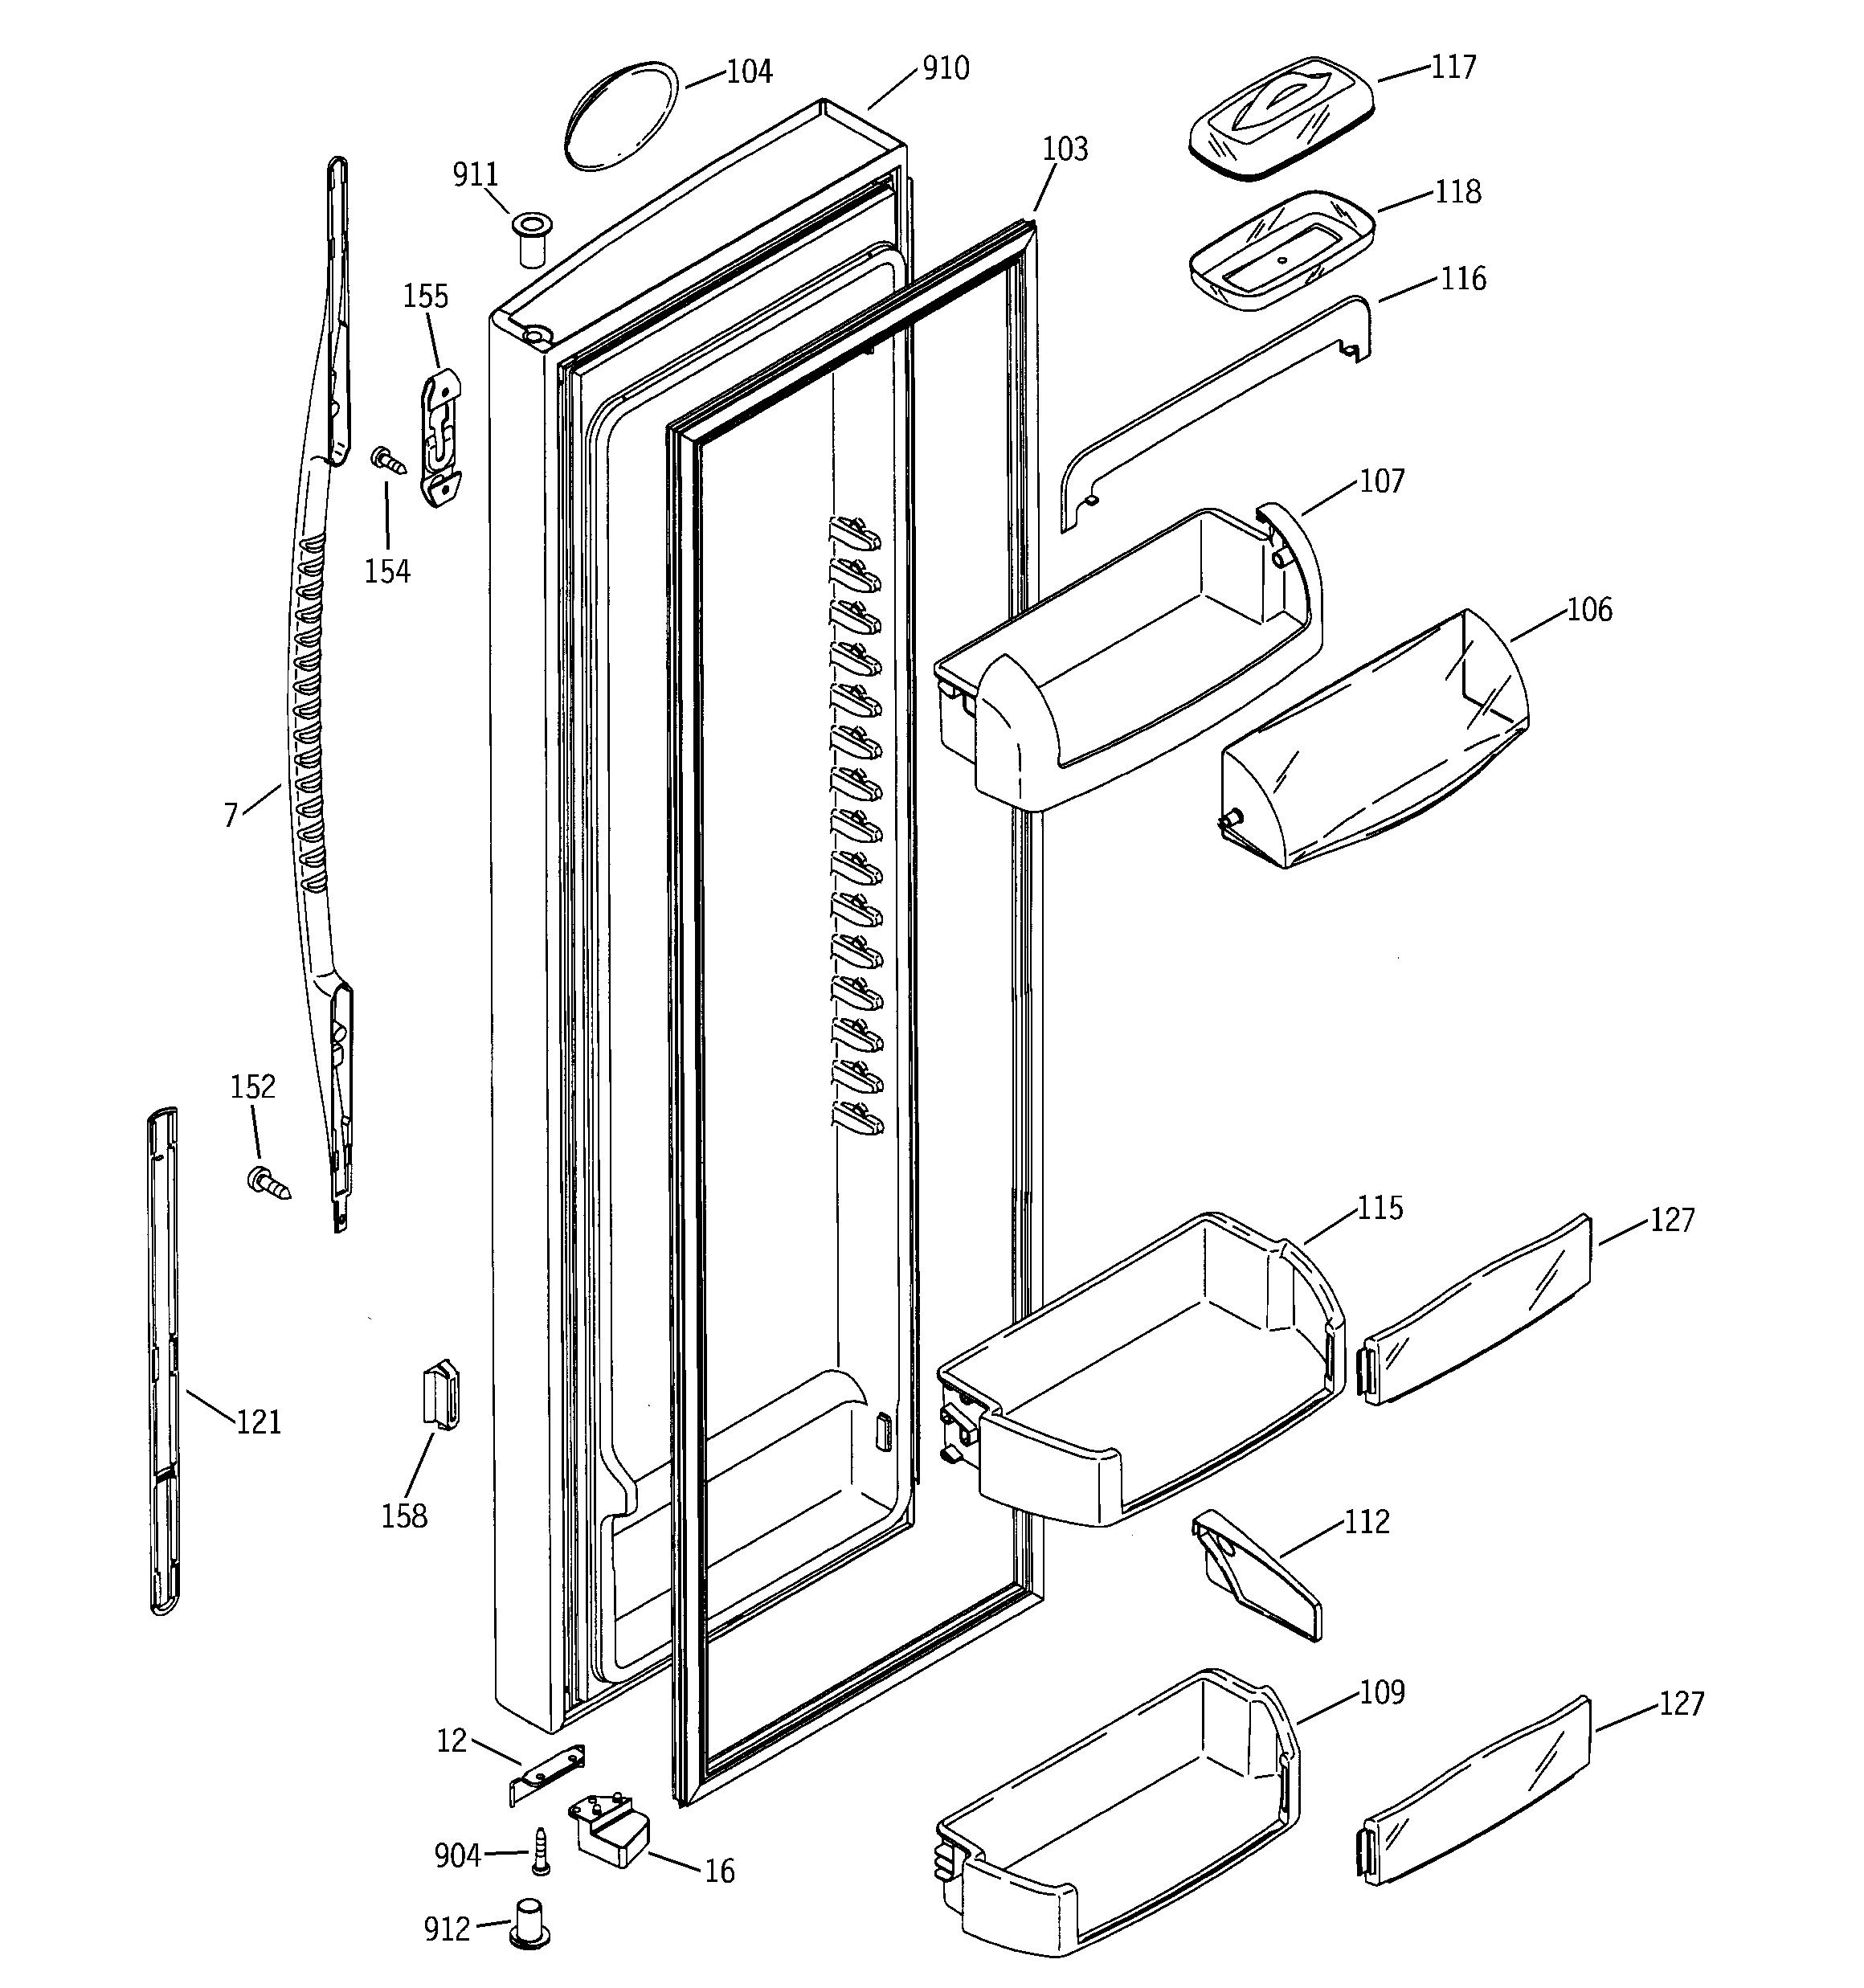 general electric wiring diagram 1948 ge refrigerator schematic wind repeat1 klictravel nl  1948 ge refrigerator schematic wind